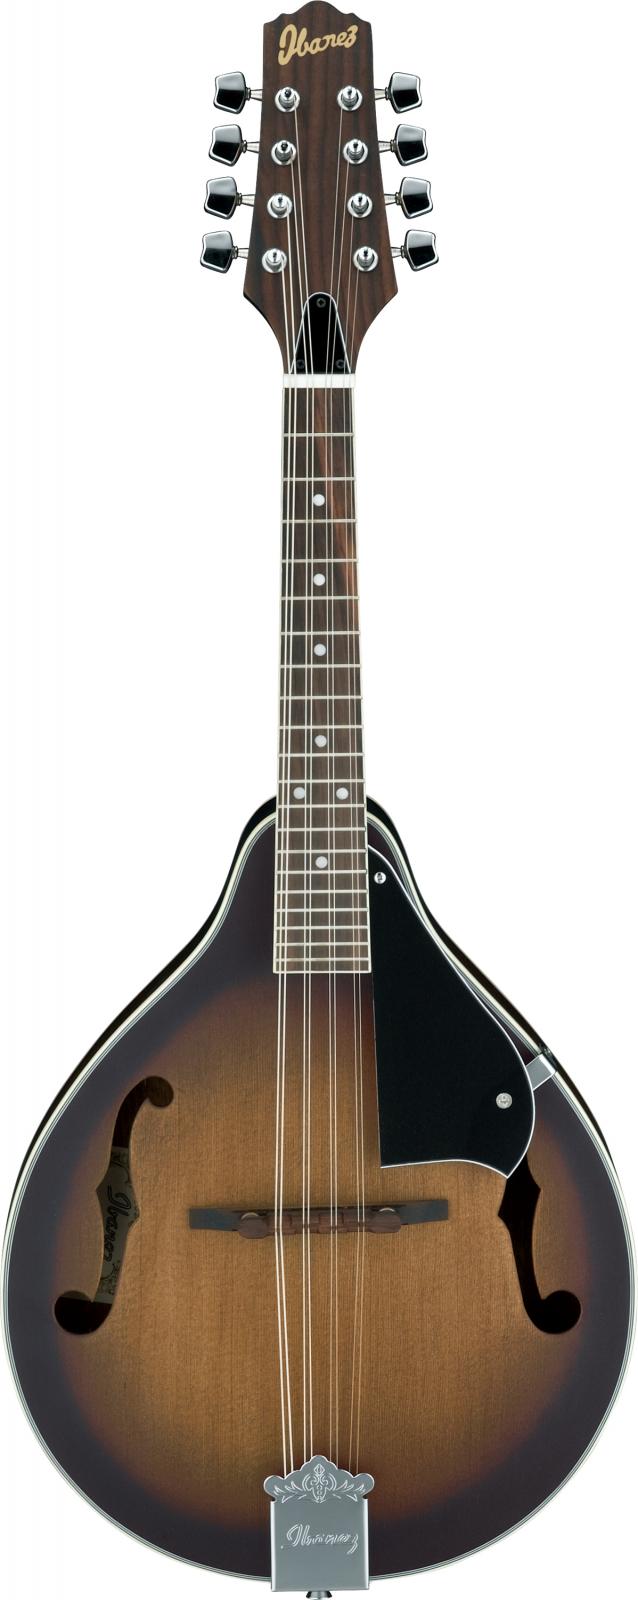 Ibanez M510-OVS Folk M 8str Mandolin Guitar - Open Pore Vintage Sunburst